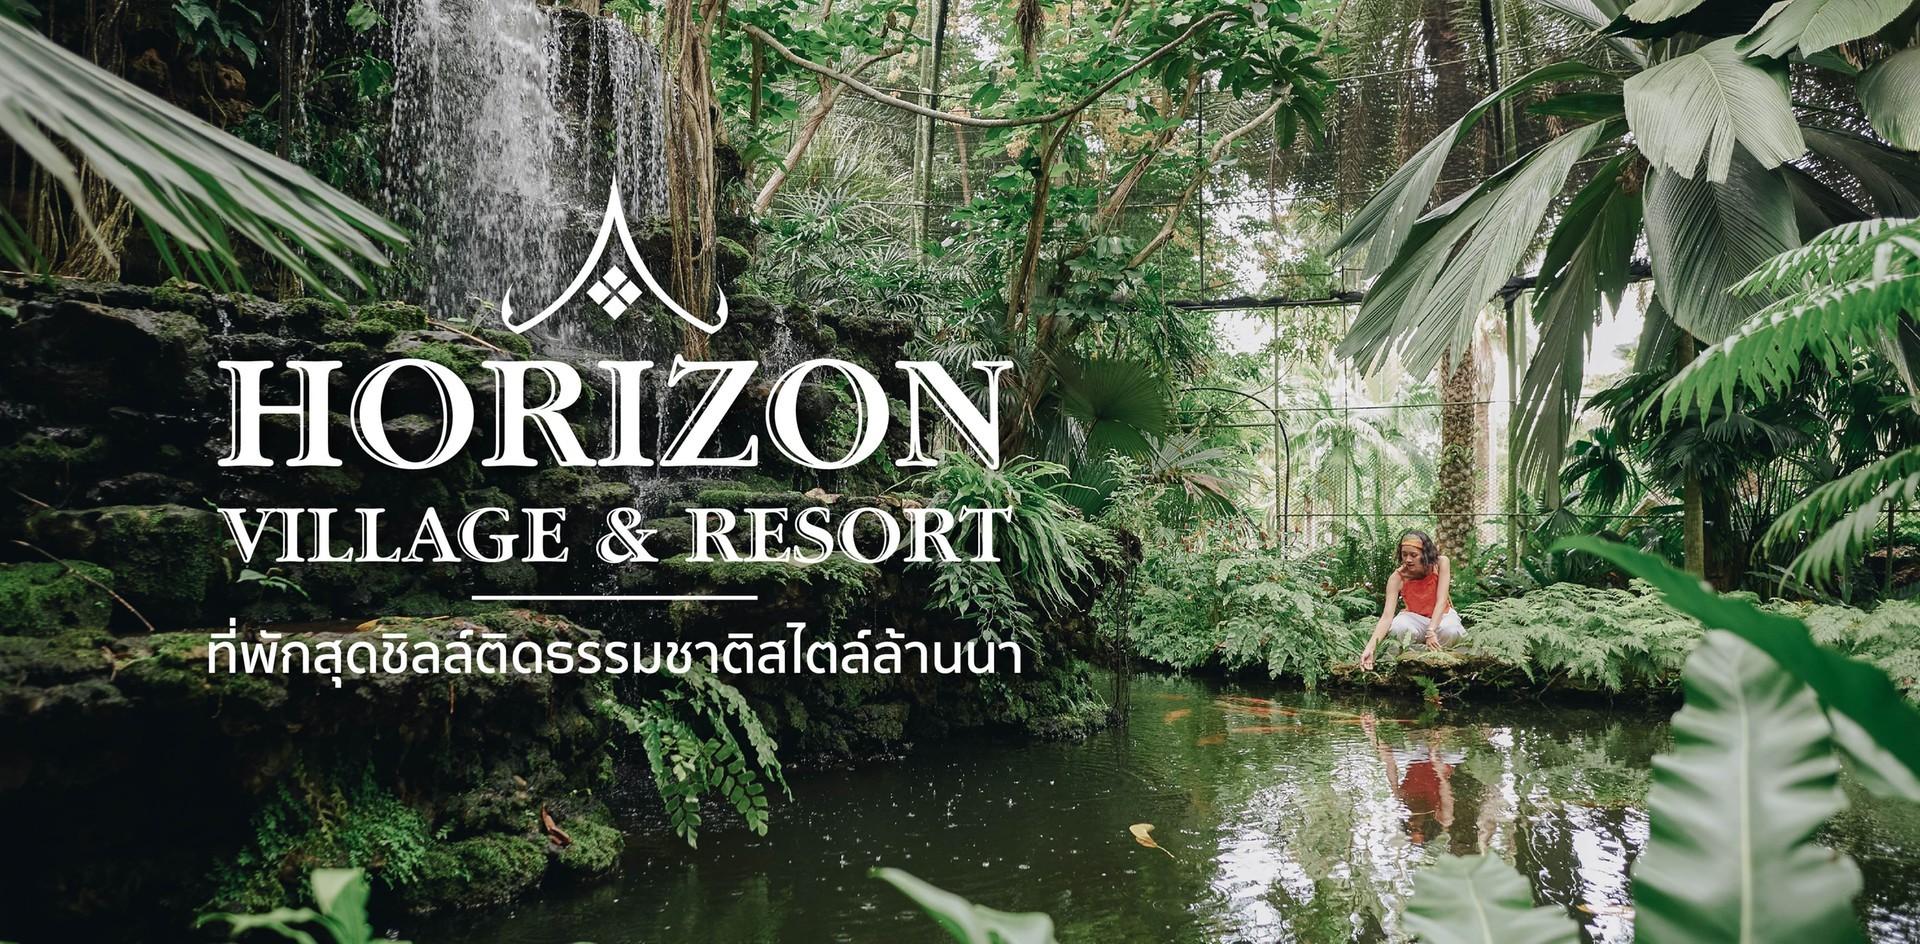 """Horizon Village & Resort"" ที่พักสุดชิลล์ติดธรรมชาติสไตล์ล้านนา"